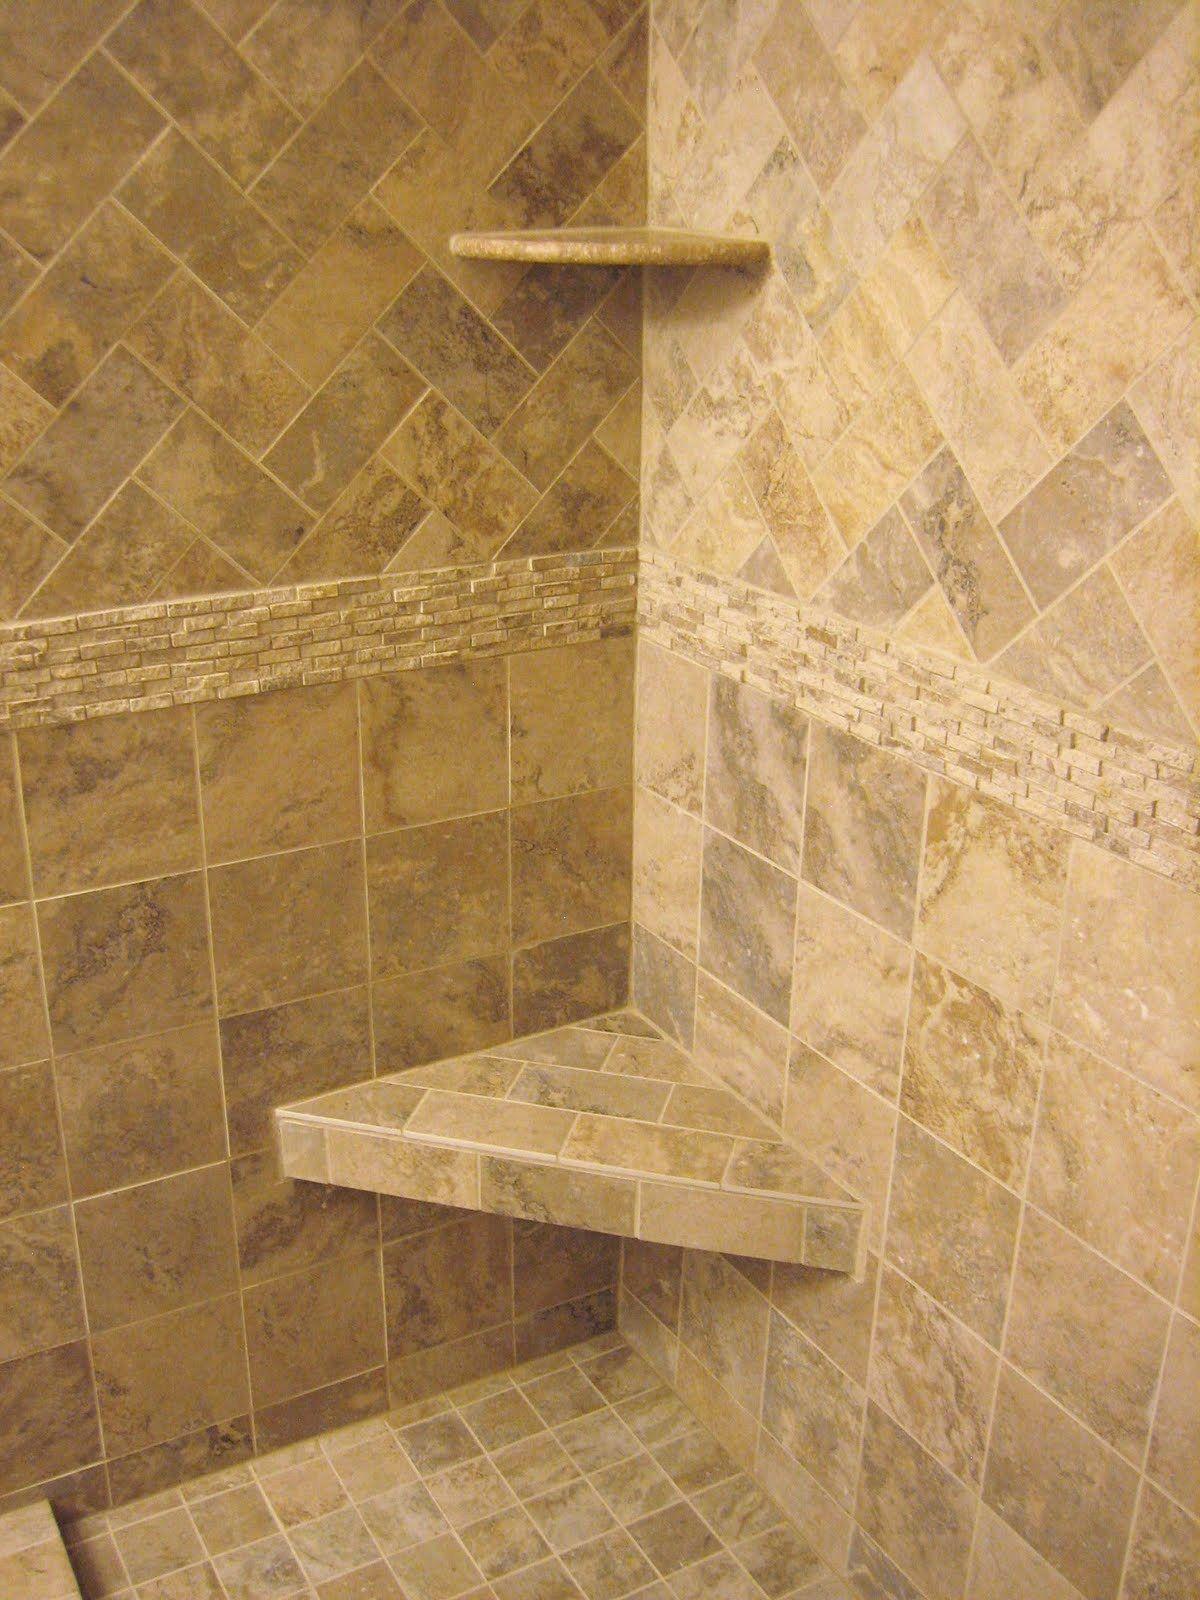 Corner bathroom shower designs - Bathroom Inspiration Immaculate Corner Caddy Bath Over Small